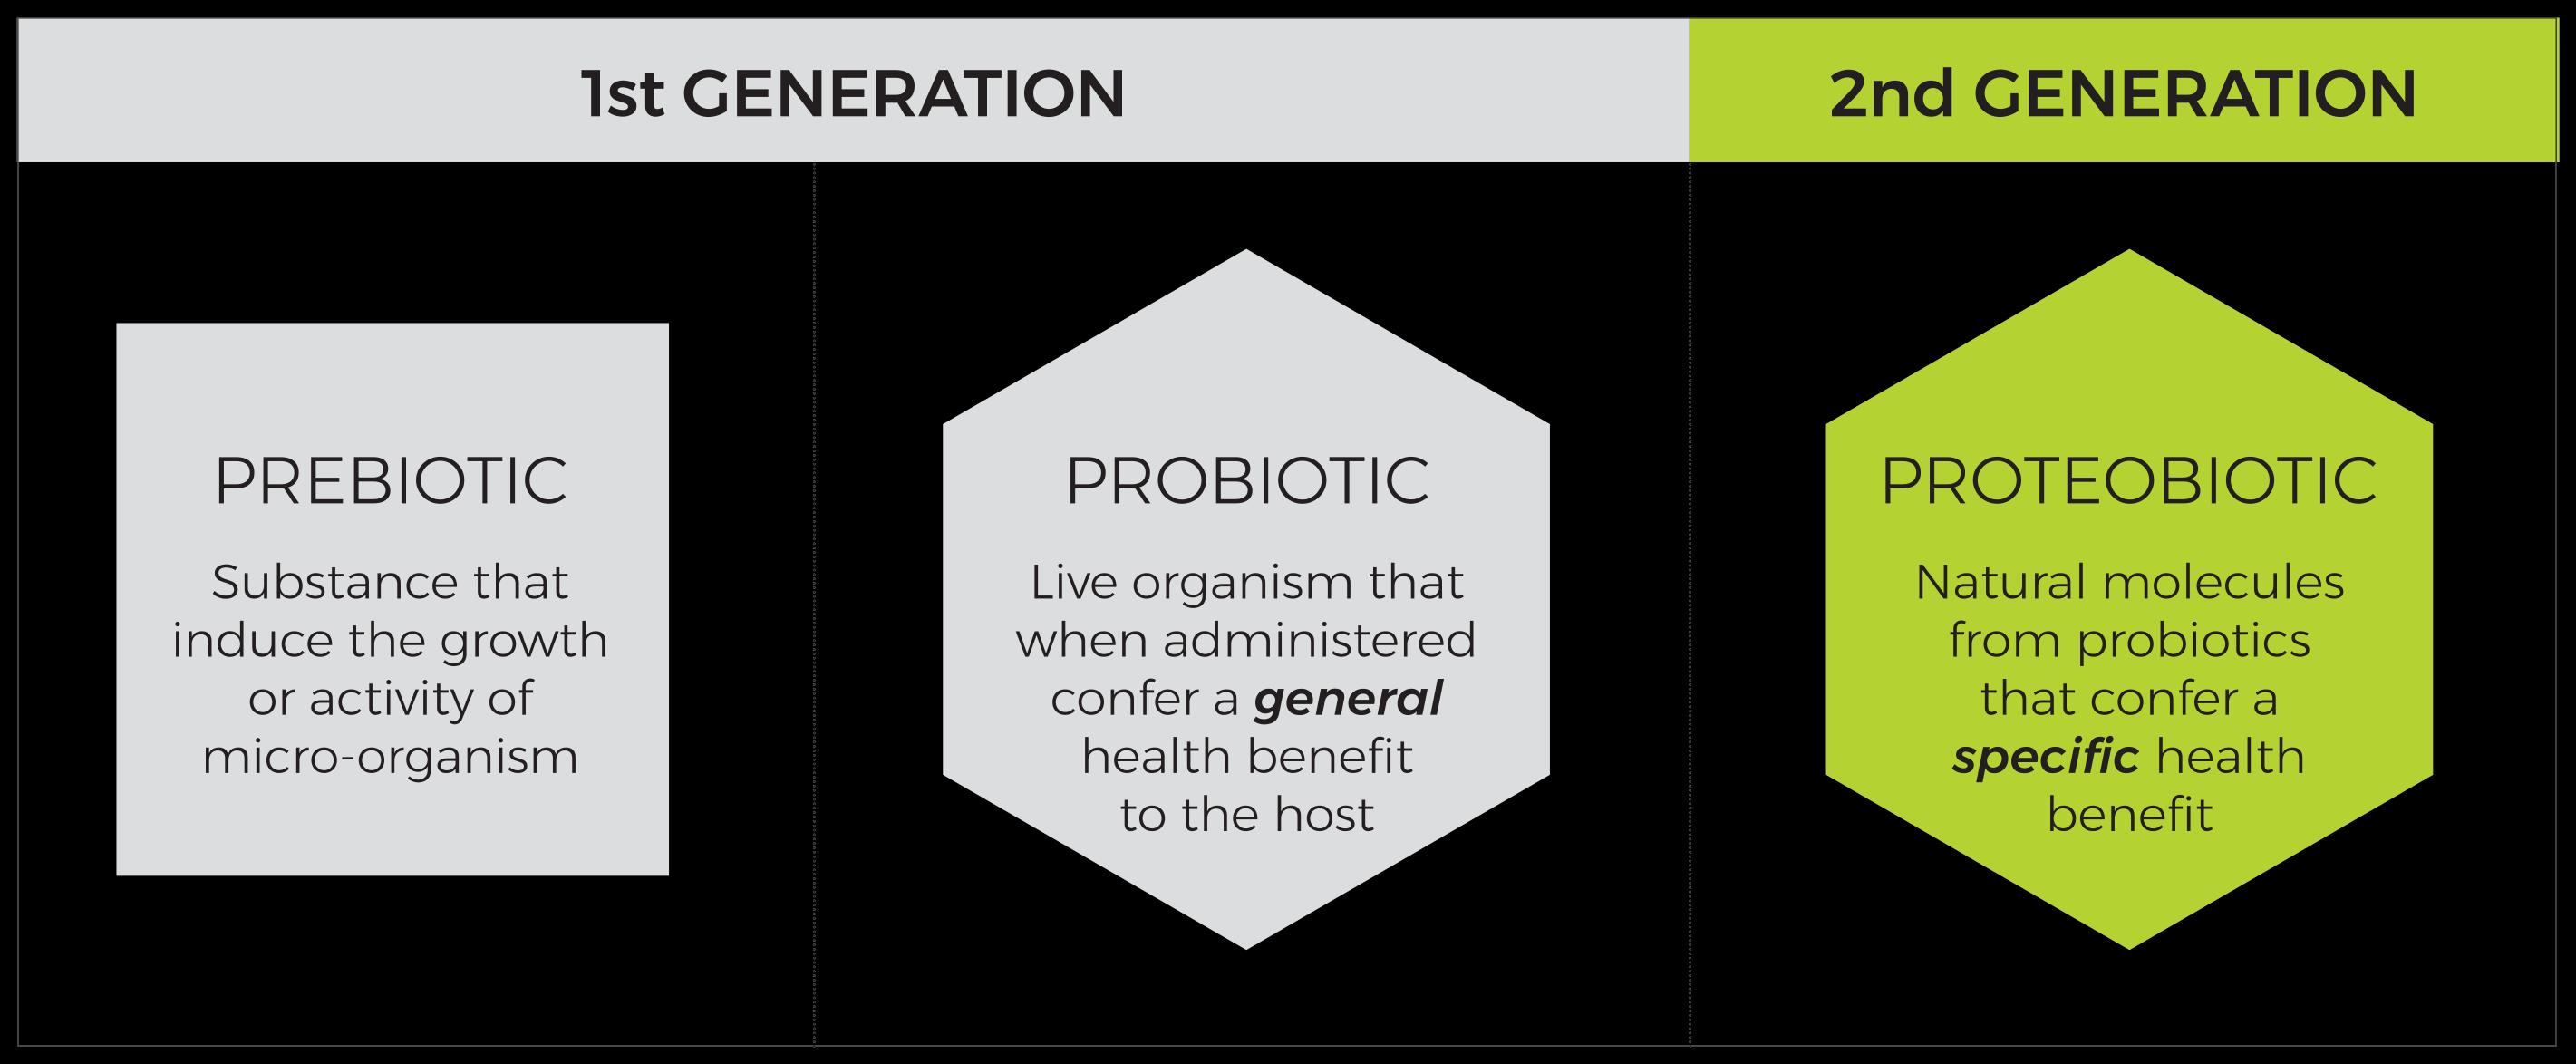 1st Generation: Prebiotic, Probiotic | 2nd Generation Proteobiotic